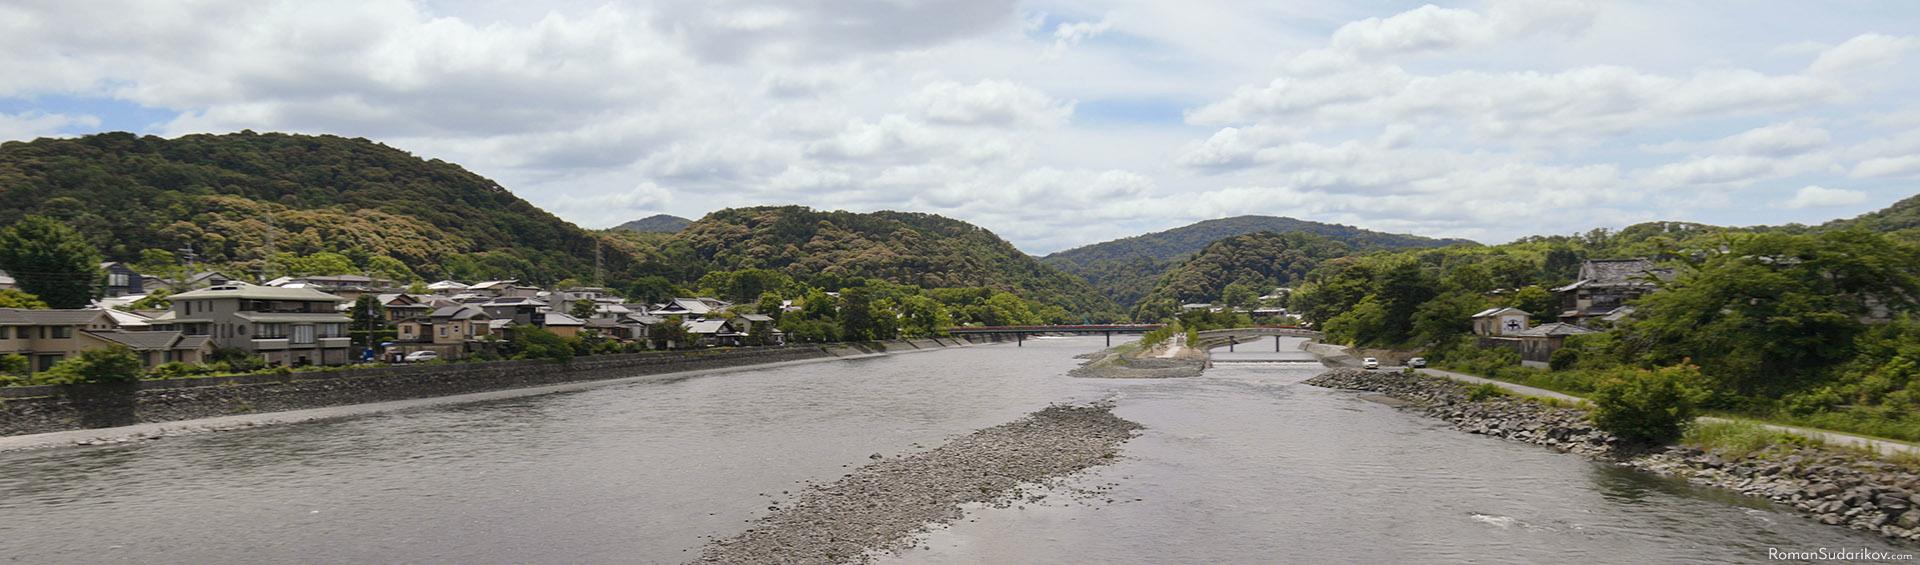 A beautiful view of the river from Uji Bridge